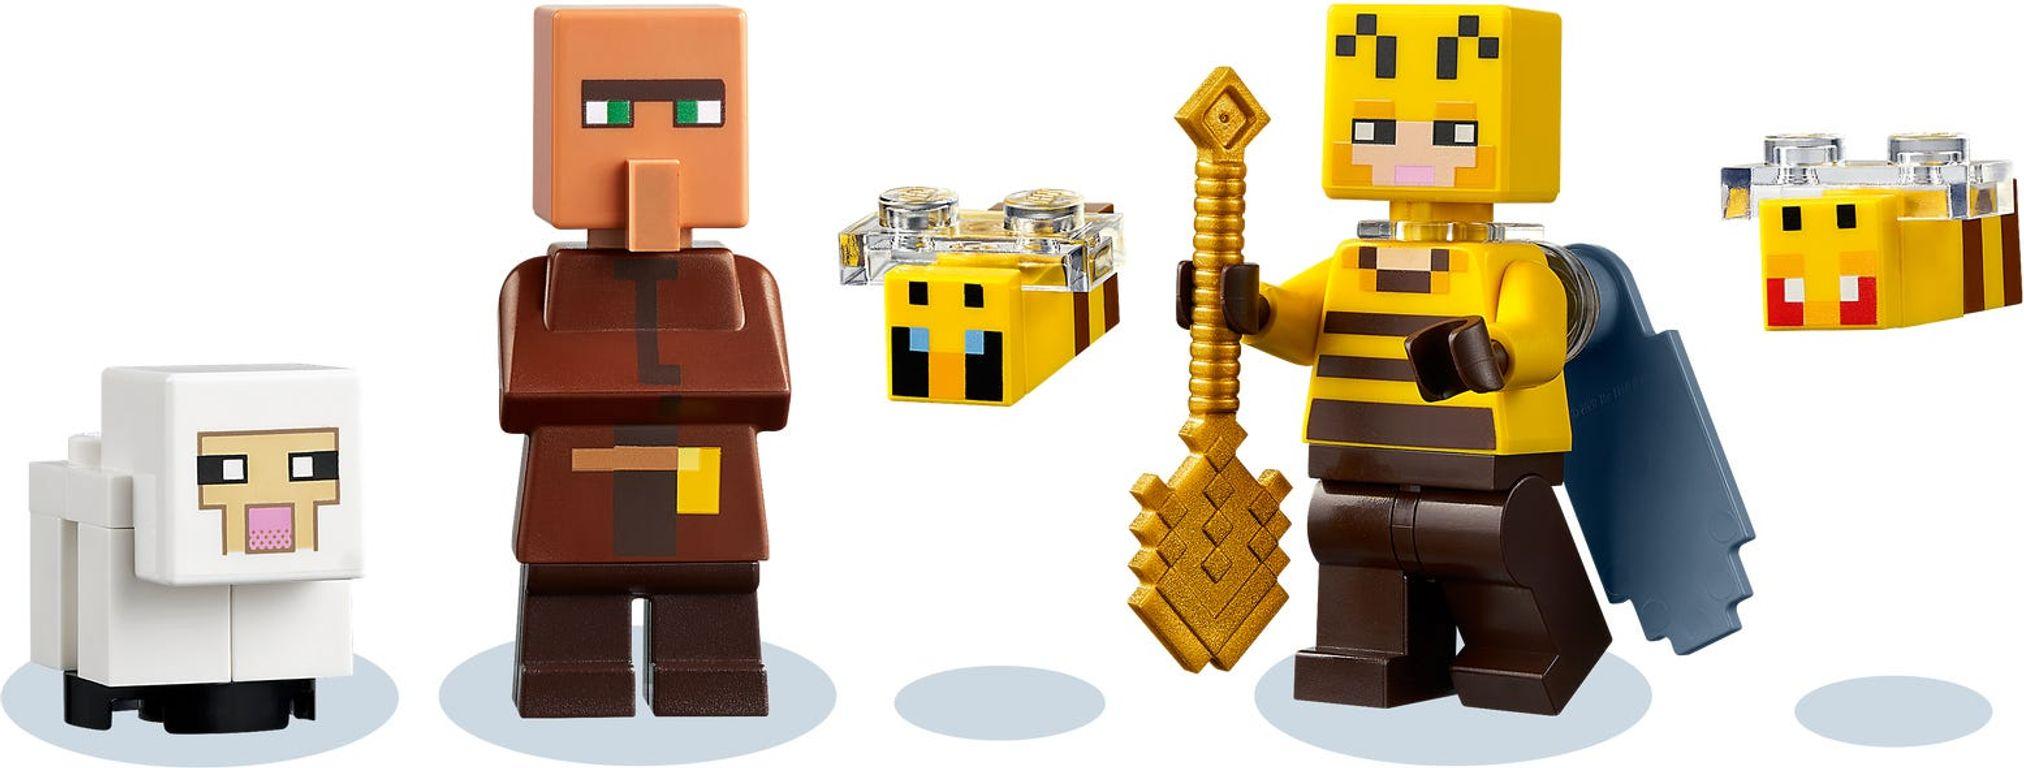 LEGO® Minecraft The Bee Farm minifigures